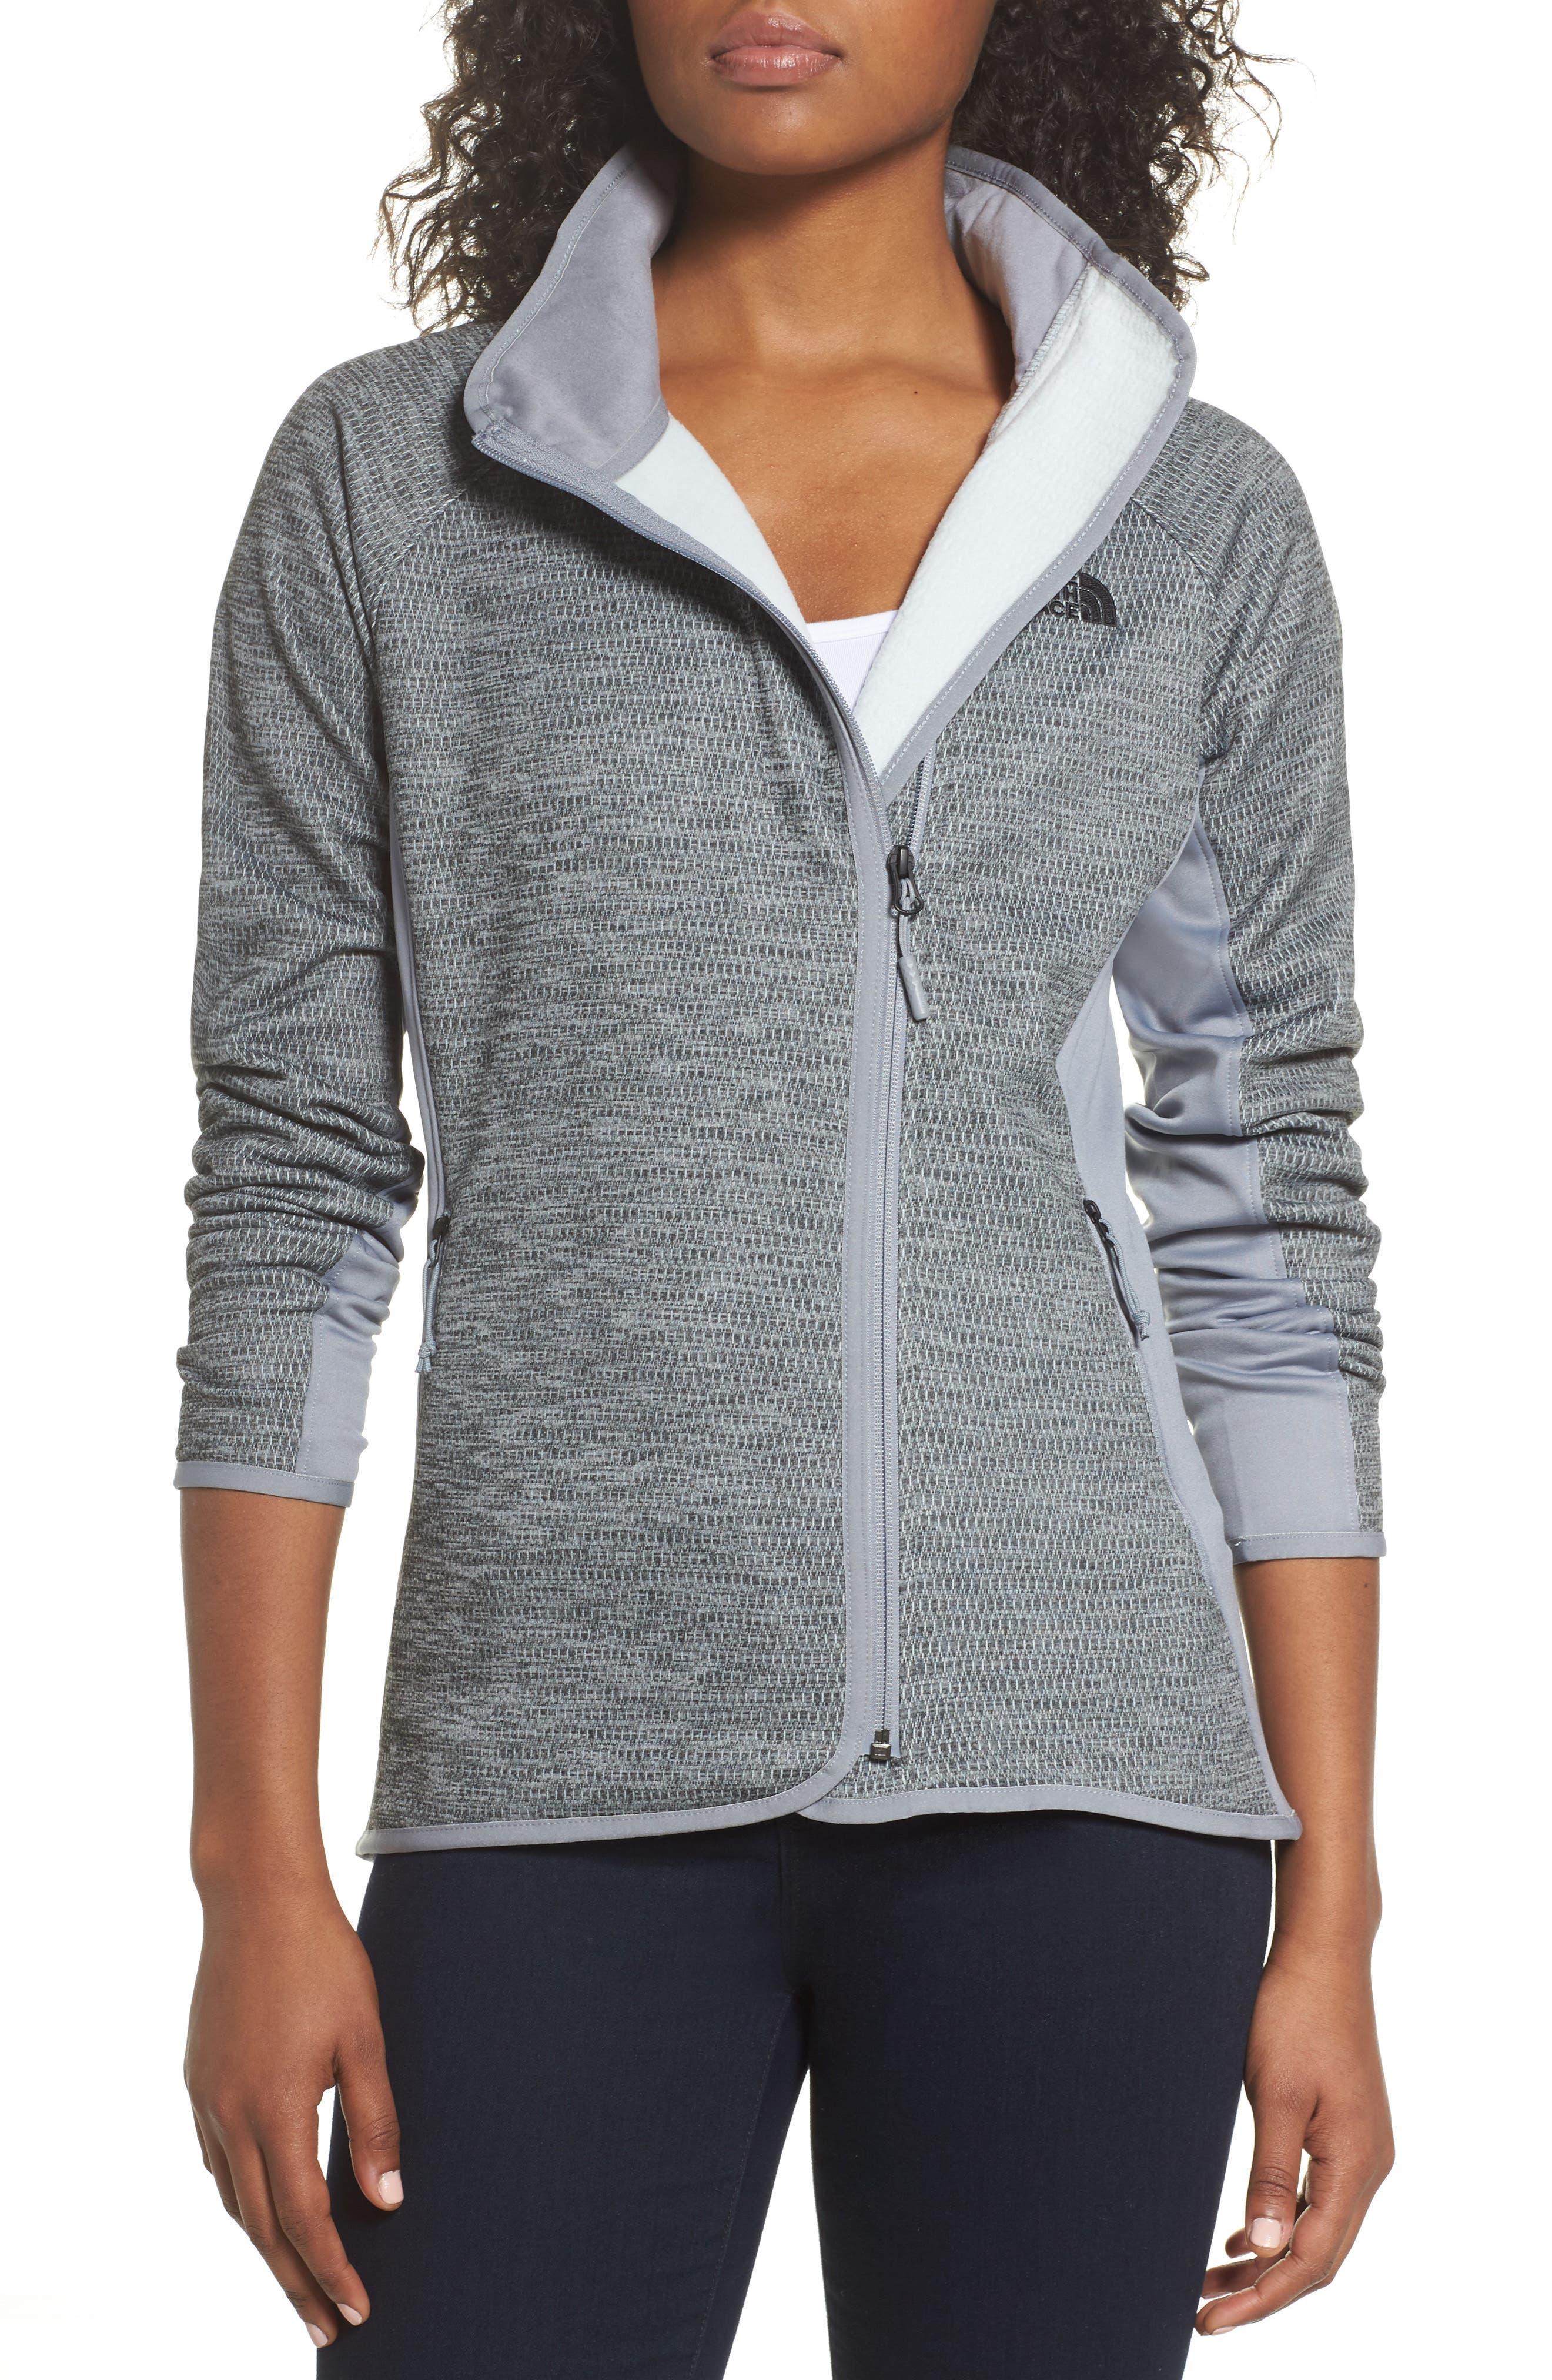 Arcata Zip Jacket,                             Main thumbnail 1, color,                             Tnf Mid Grey Heather/ Black